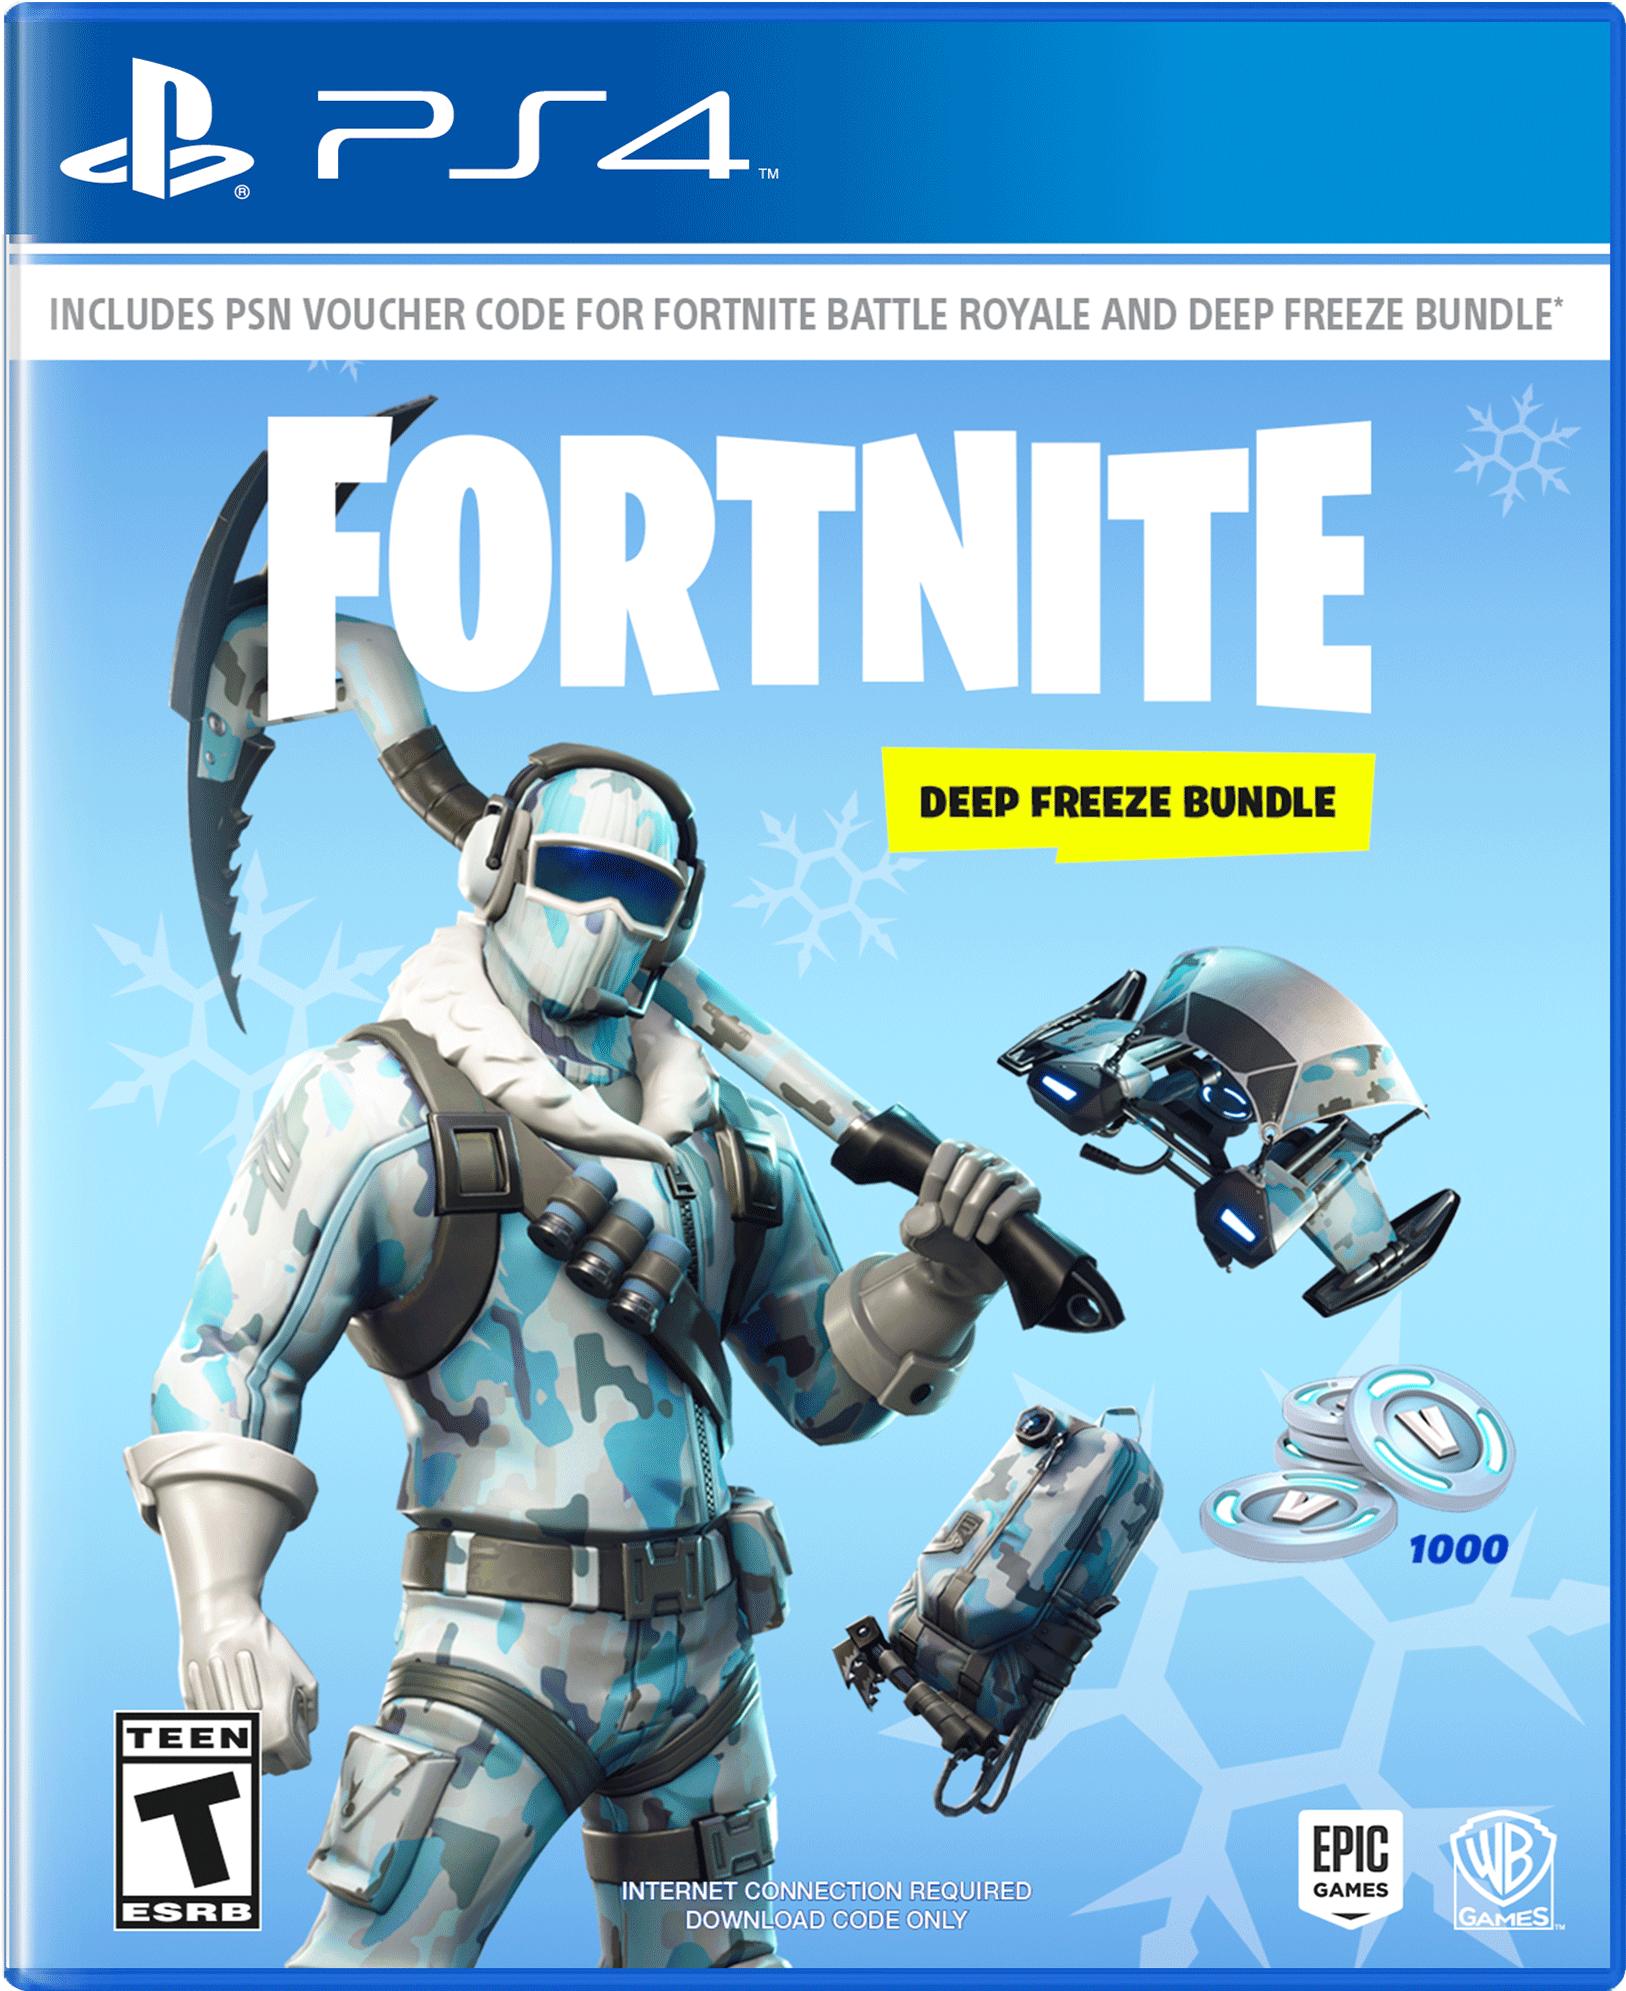 Fortnite Digital Standard Edition For A Friend Fortnite Deep Freeze Bundle Playstation 4 Gamestop